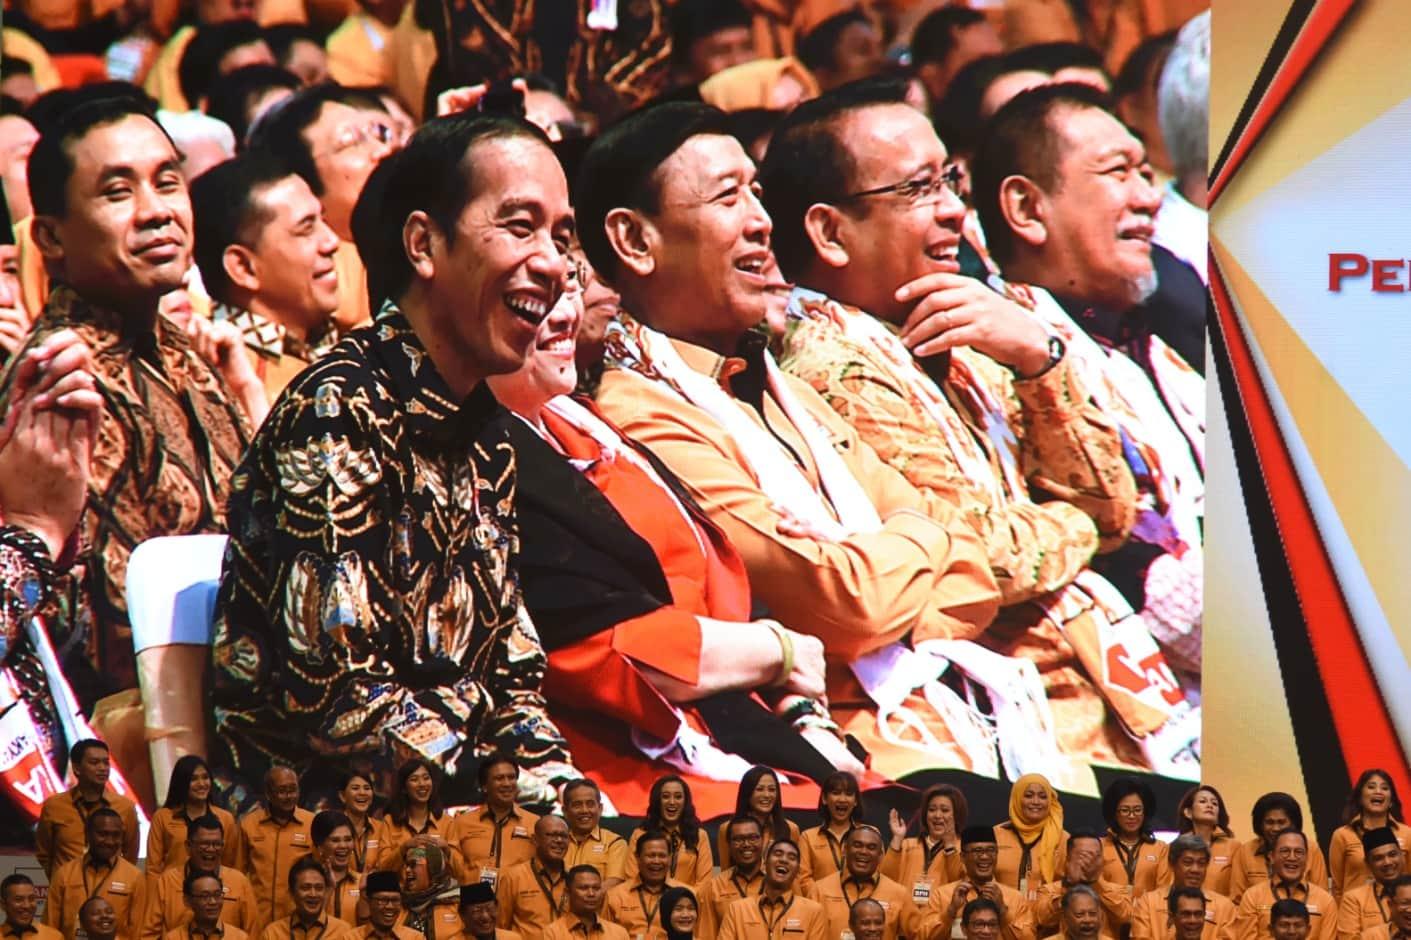 Presiden Jokowi tak bisa menahan tawa saat mendengarkan sambutan Ketua Umum DPP Partai Hanura Oesman Sapta, pada pengukuhan DPP Partai Hanura, di SICC, Bogor, Jabar, Rabu (23/2) pagi. (Foto: OJI/Humas)